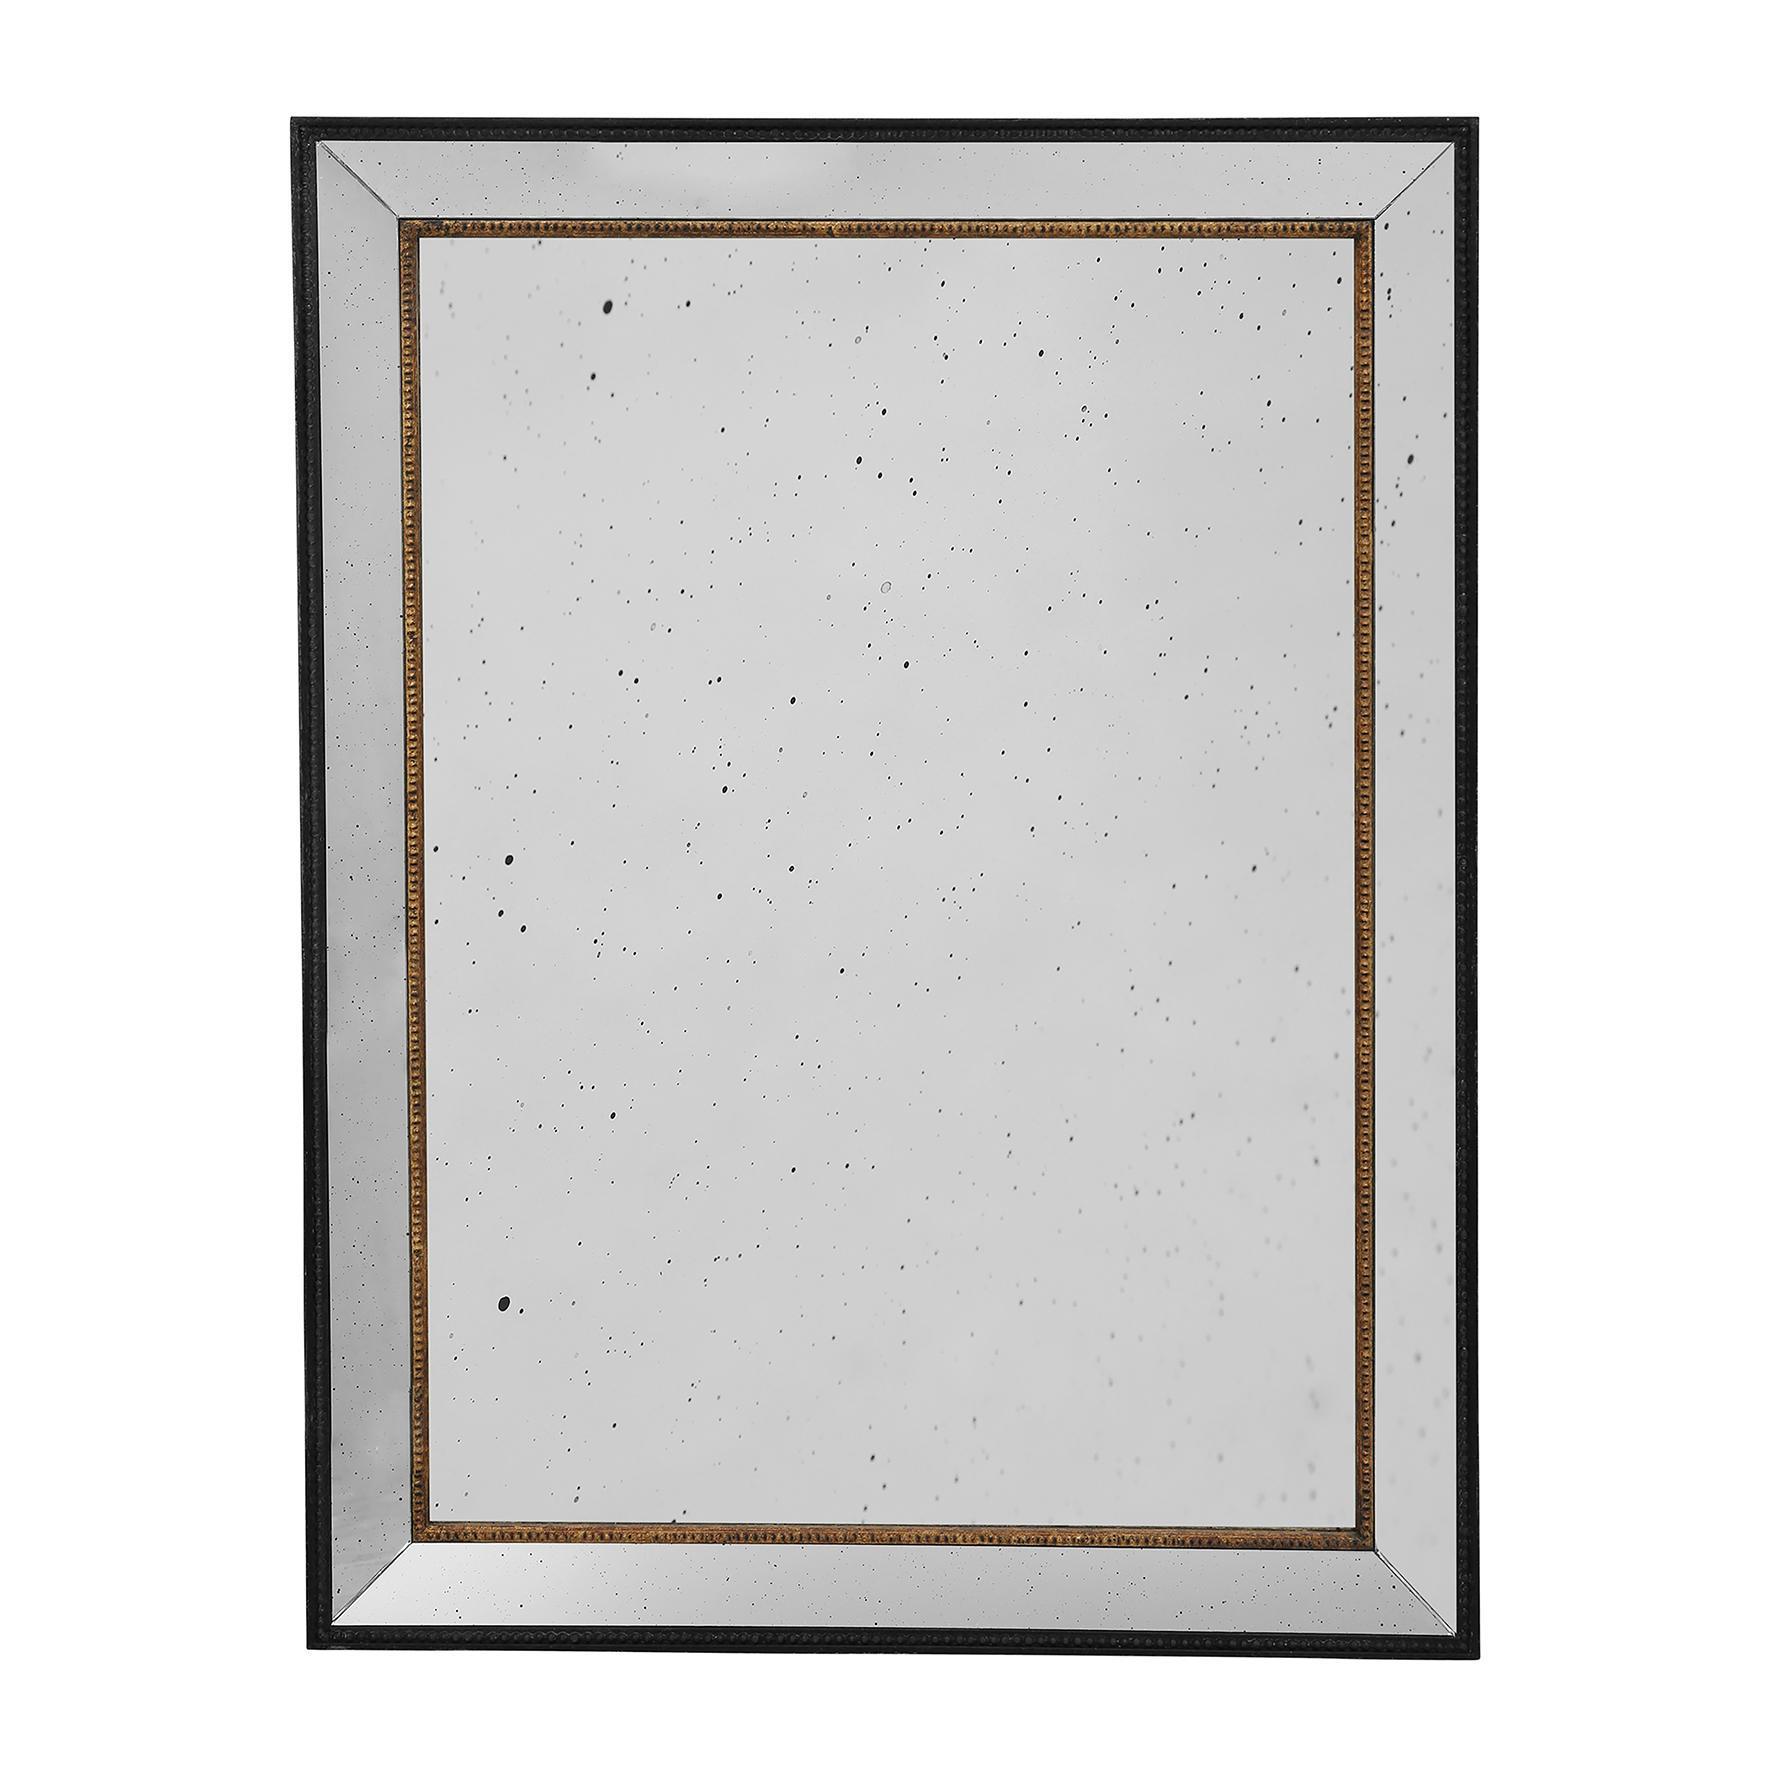 CÔTÉ TABLE Zrcadlo Antique brozne, zlatá barva, sklo, dřevo